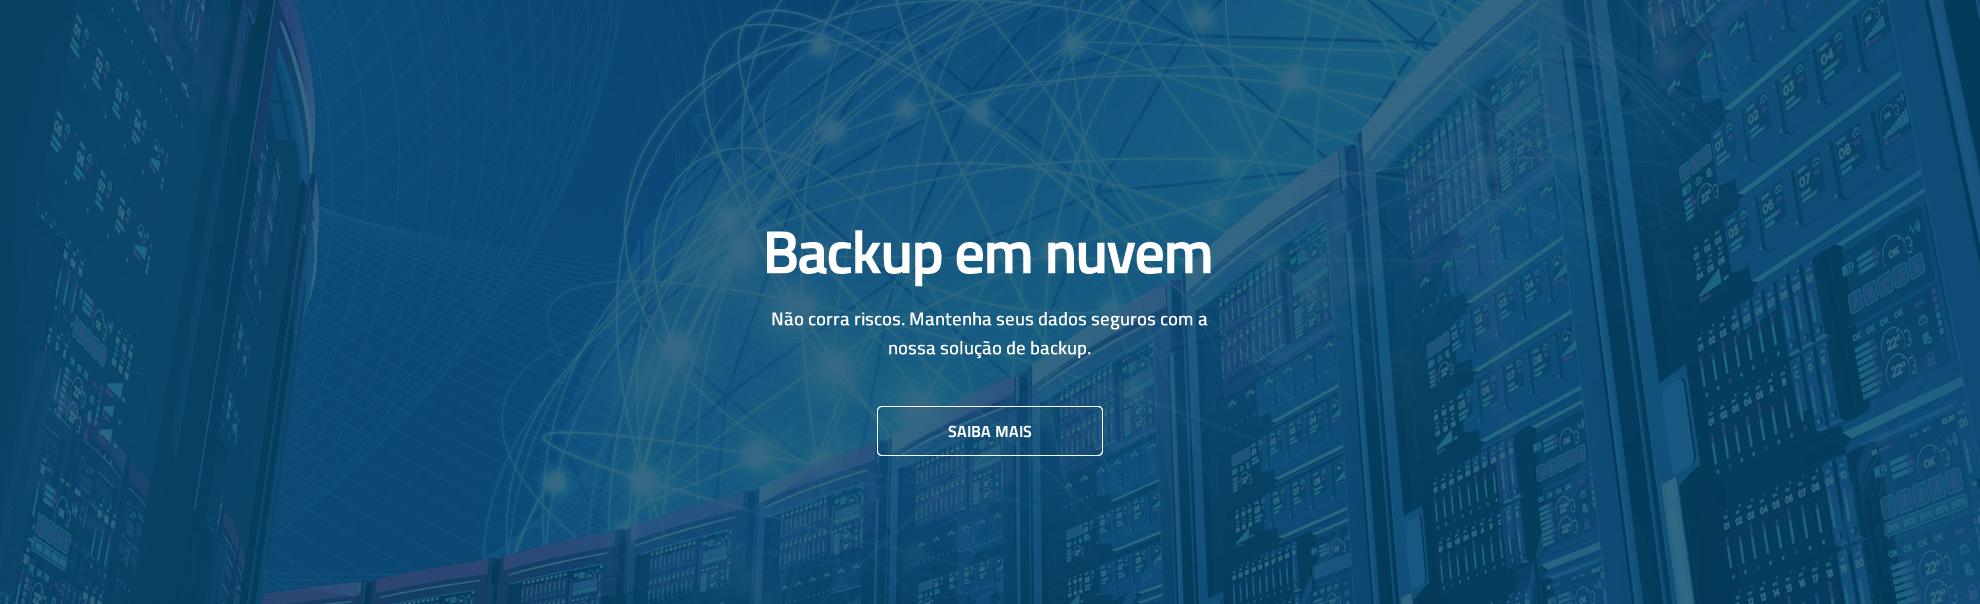 https://3solutions.com.br/destaque/backup-em-nuvem/